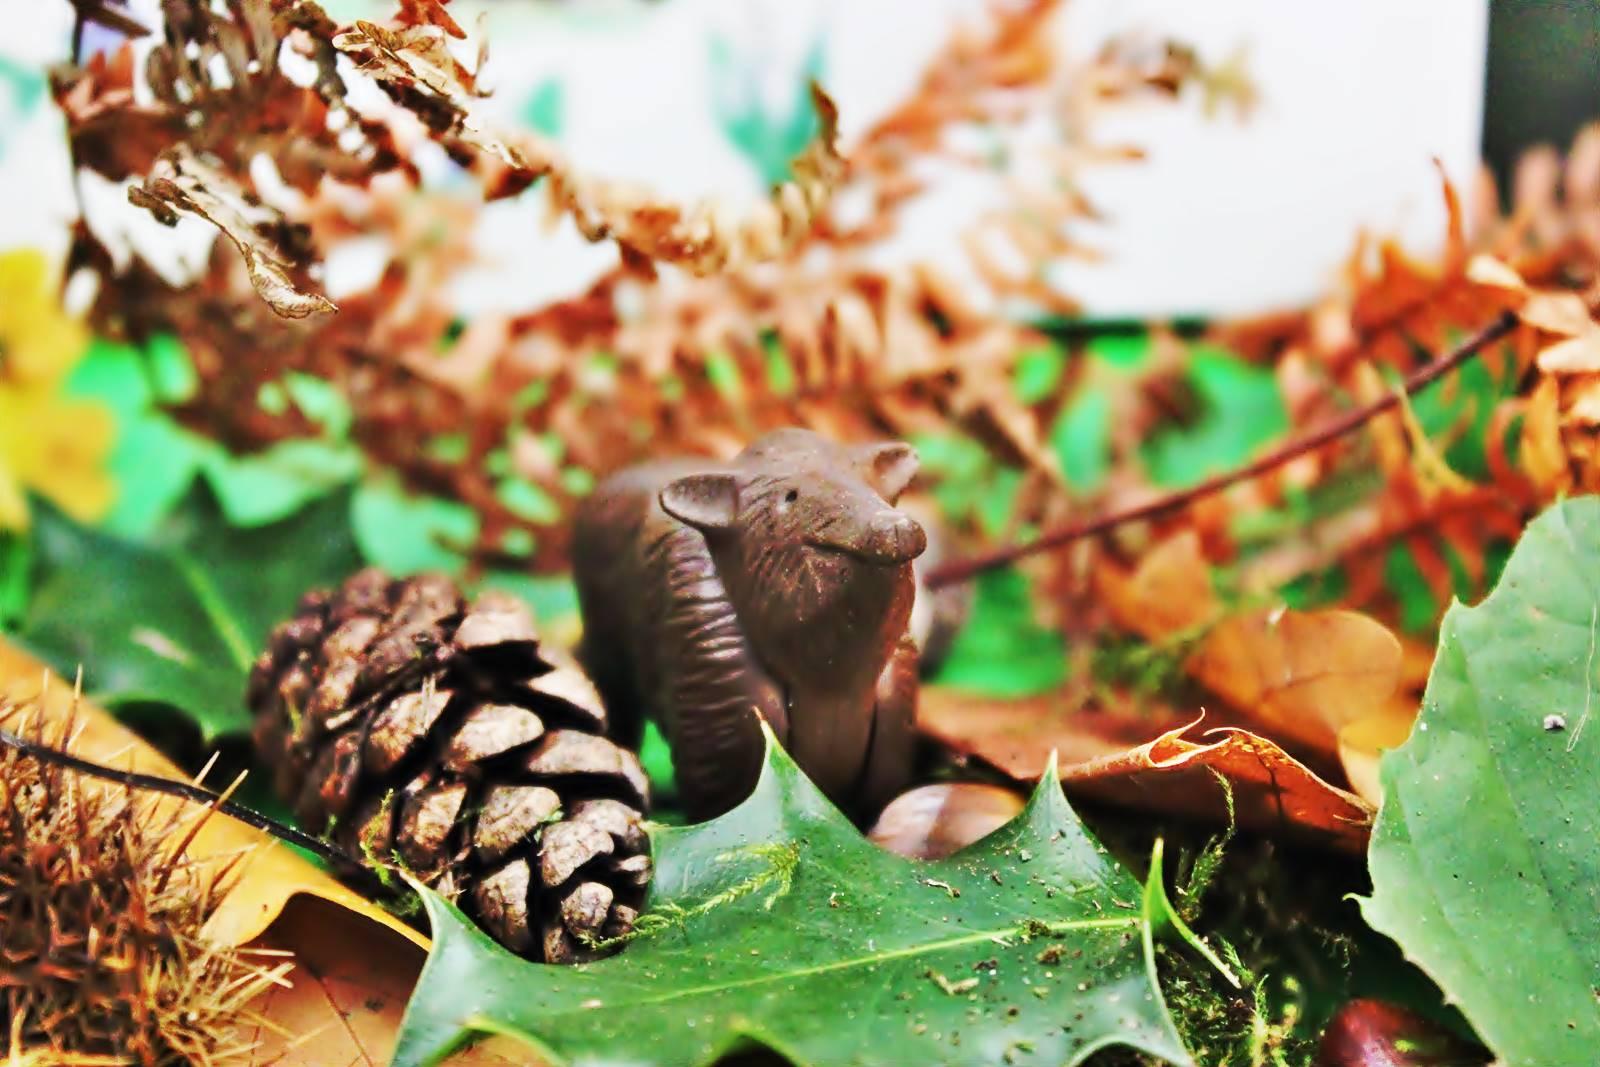 Table des saisons steiner waldorf ief homescooling ecole maison automne 1